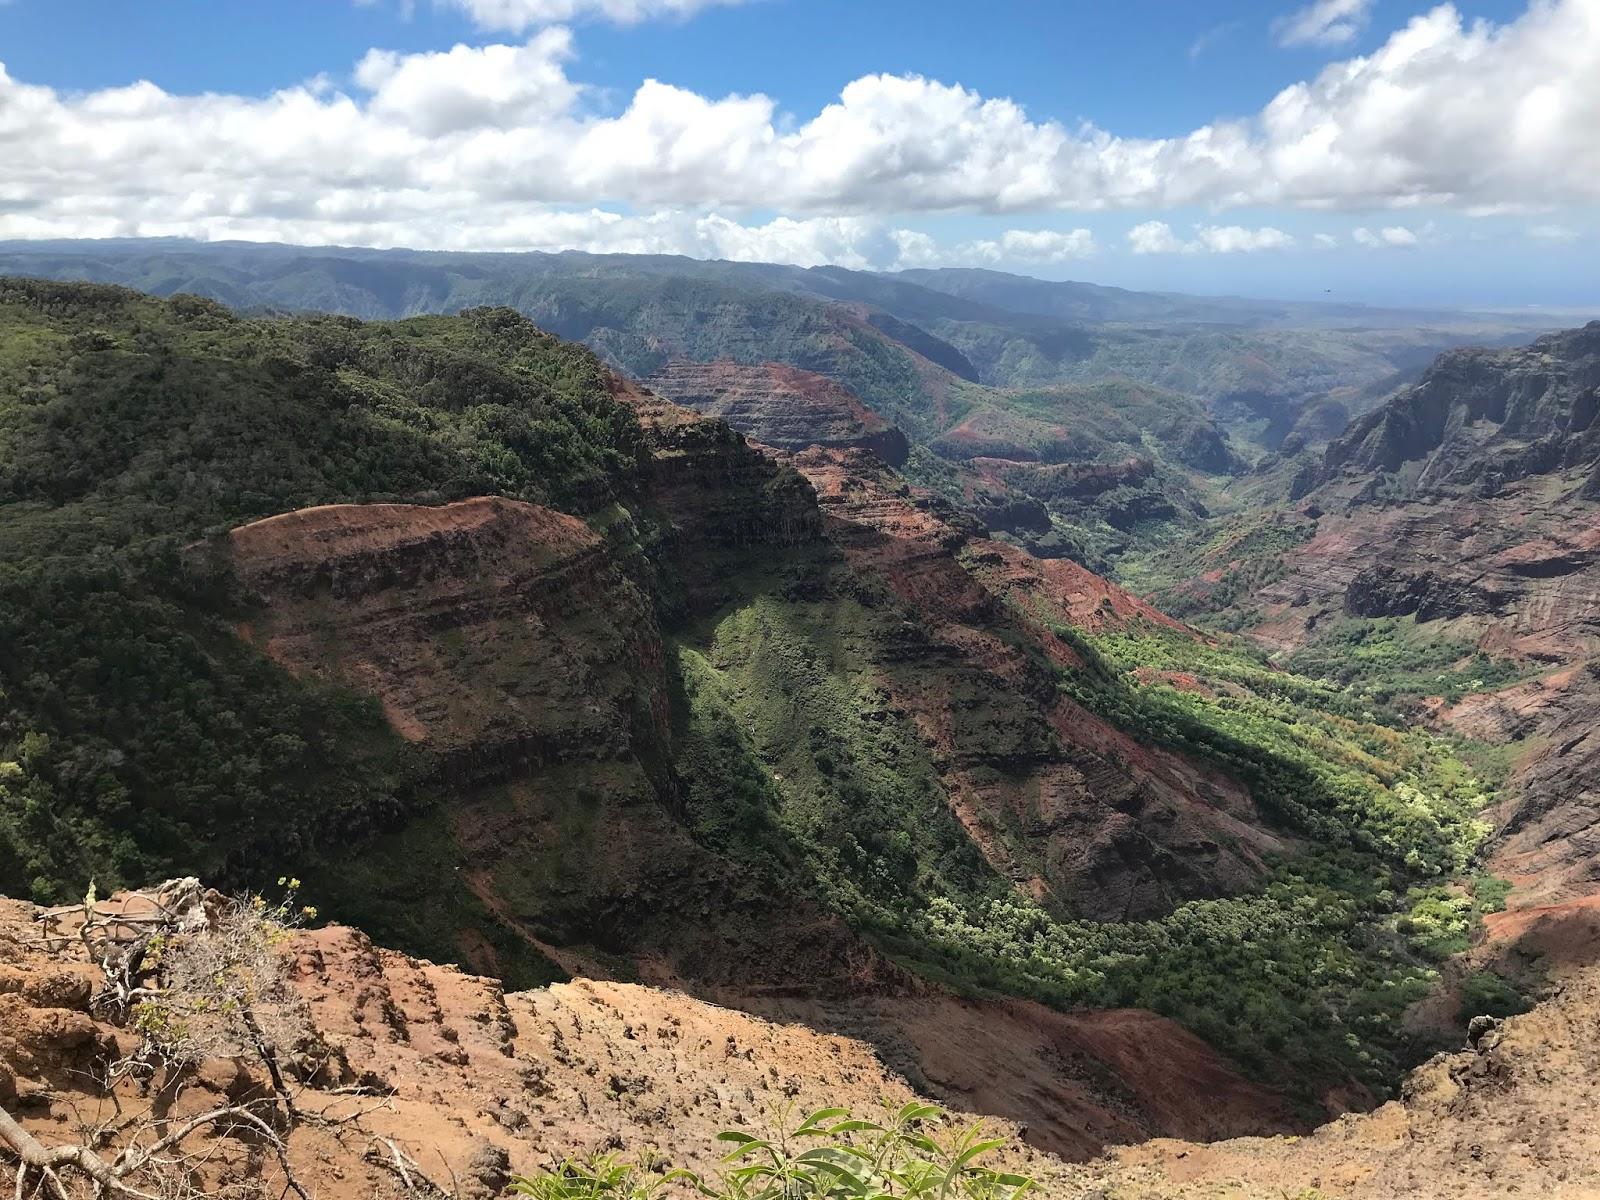 Hiking Waimea Canyon | Kauai Itinerary | What to See if Kauai | Waimea Canyon Hikes | A Memory of Us